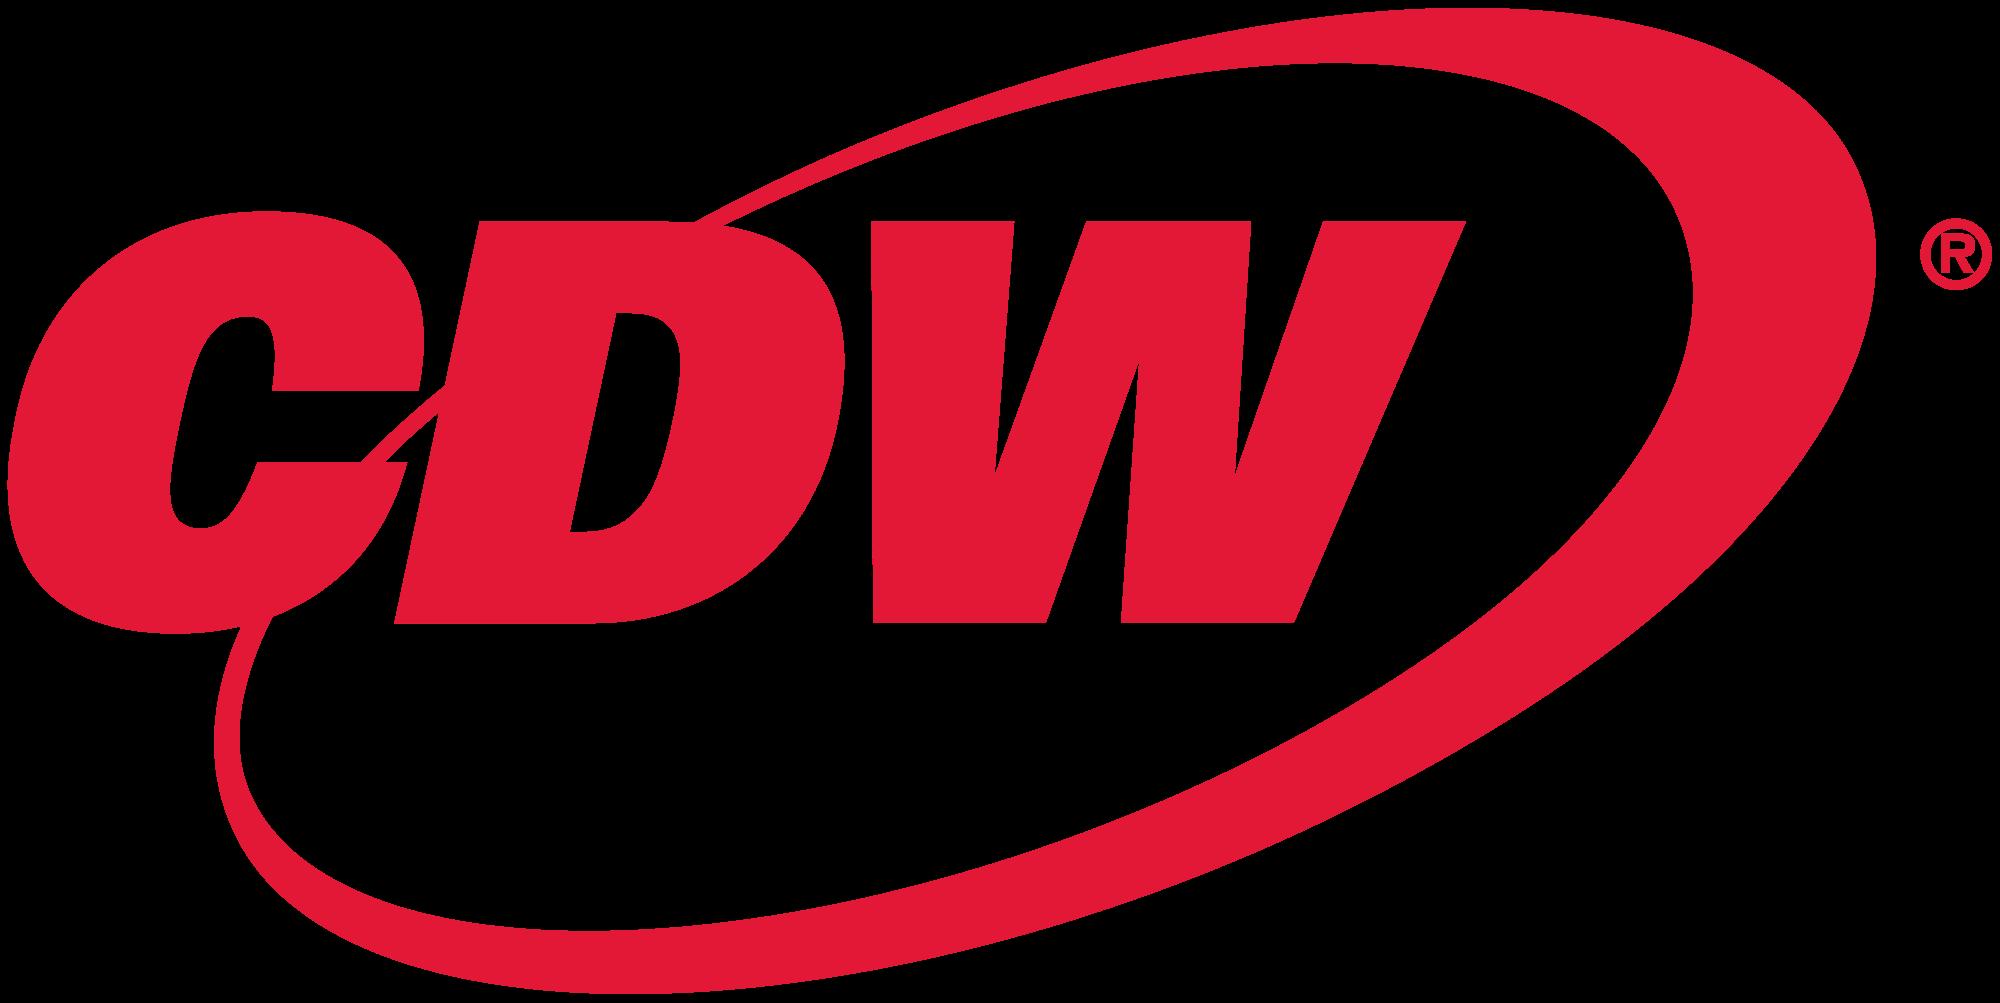 CDW Ltd. - Partner Logo.png